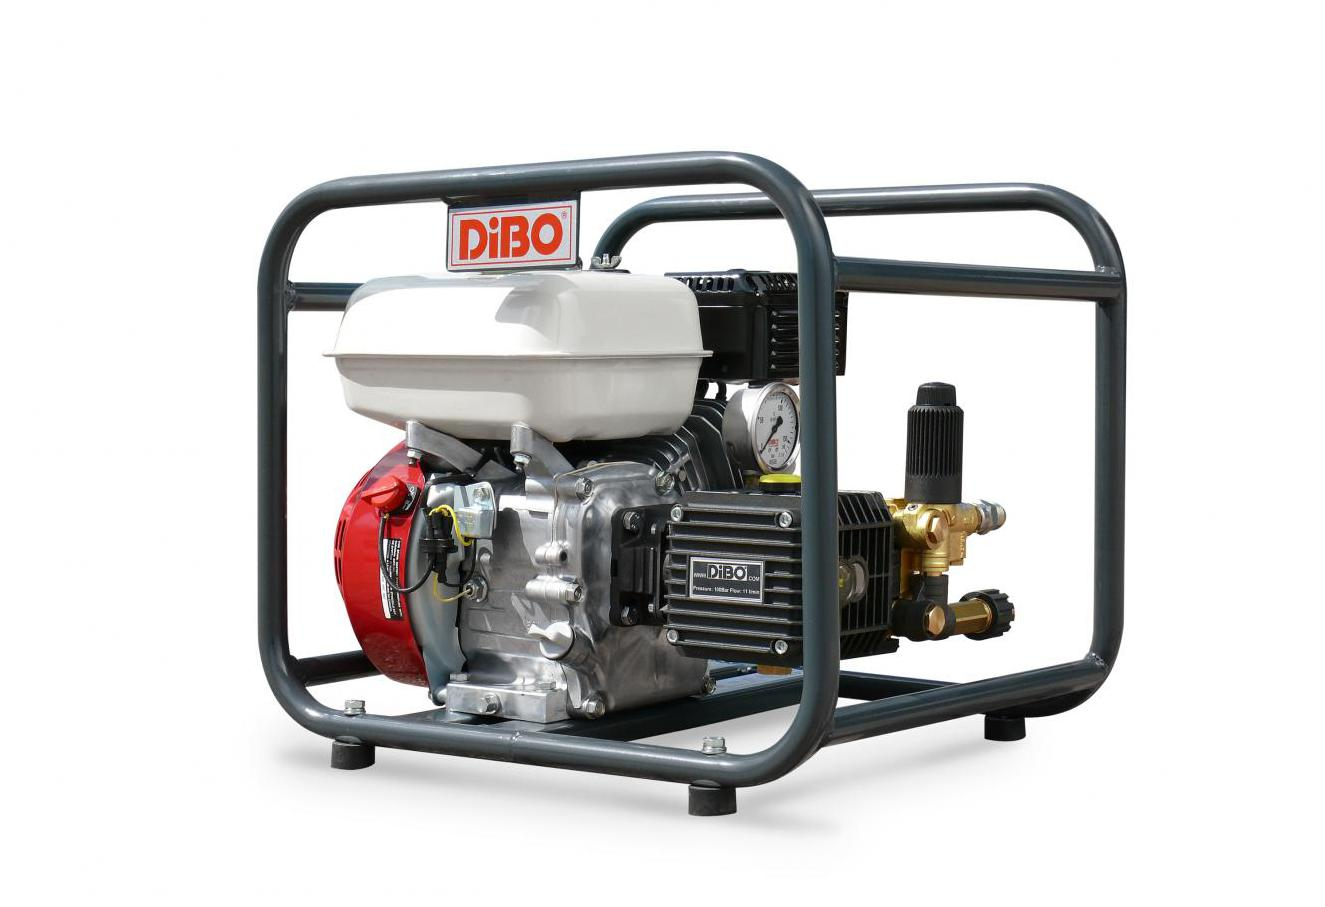 dibo-koudwaterhogedrukreinigers-brandstofmotor-ptl-s